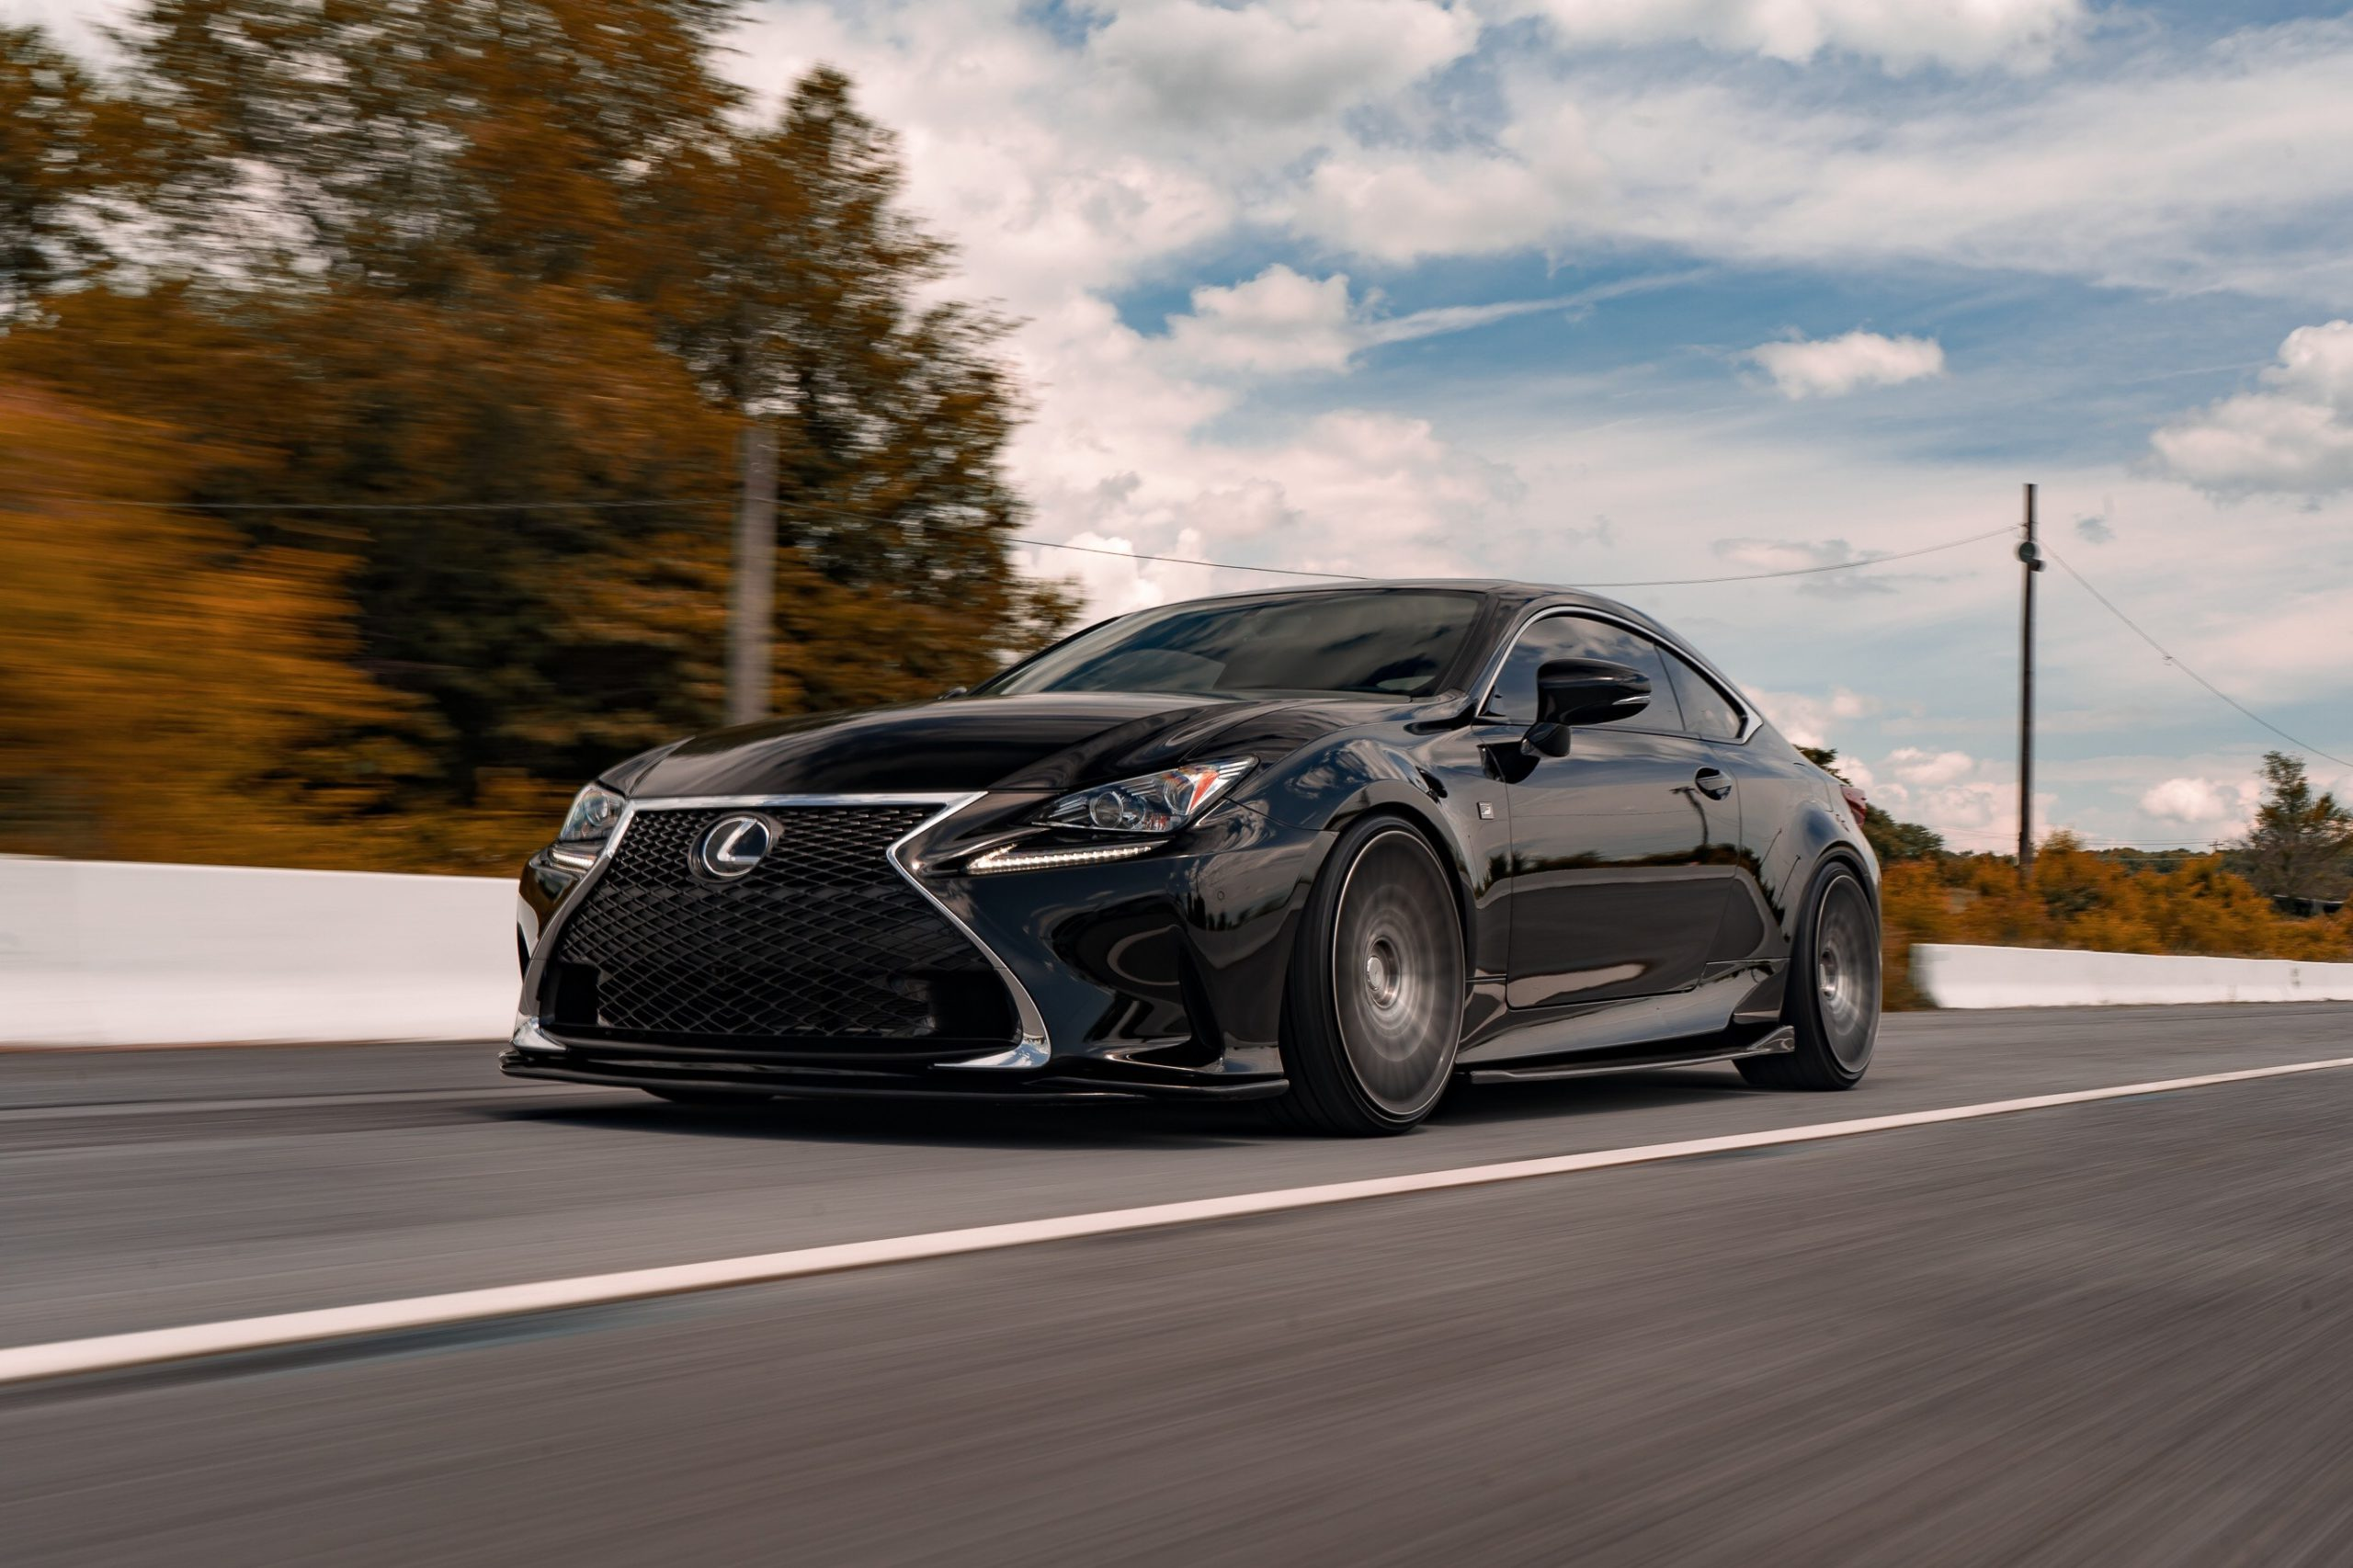 black Lexus driving on road